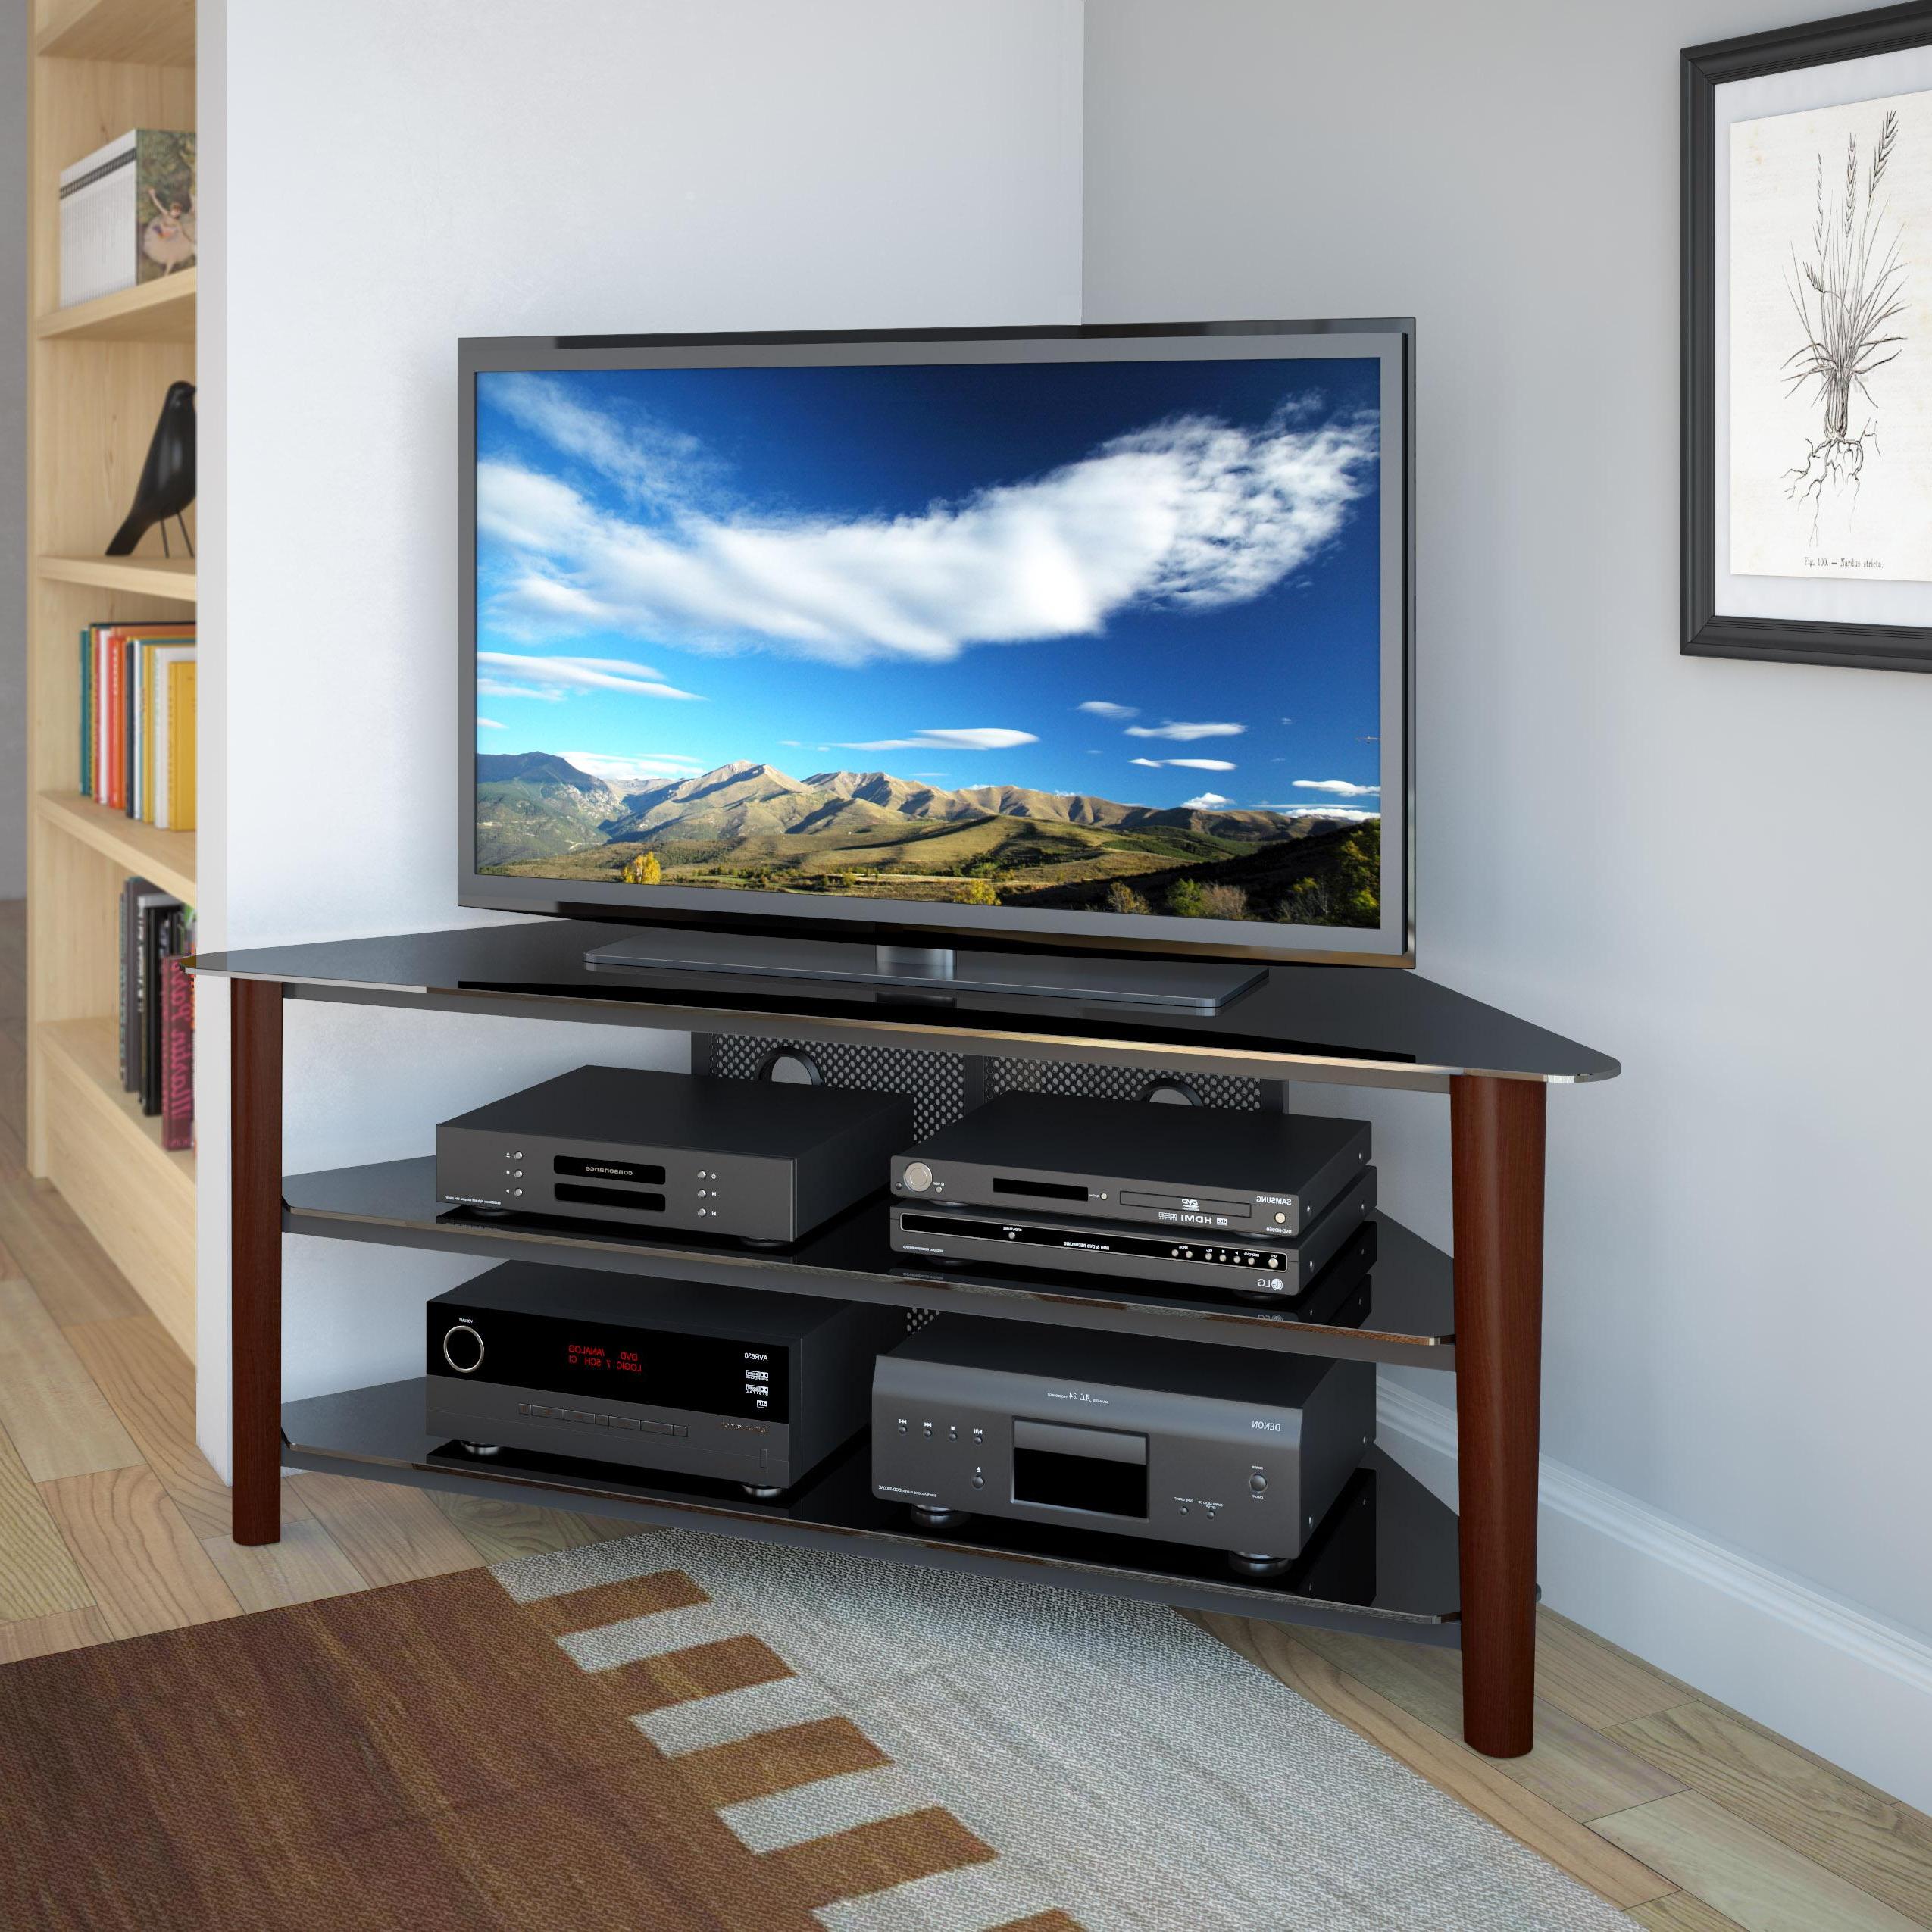 "Amazon: Corliving Tal 694 T Alturas Veneer Tv Stand Inside Trendy Kasen Tv Stands For Tvs Up To 60"" (View 15 of 25)"